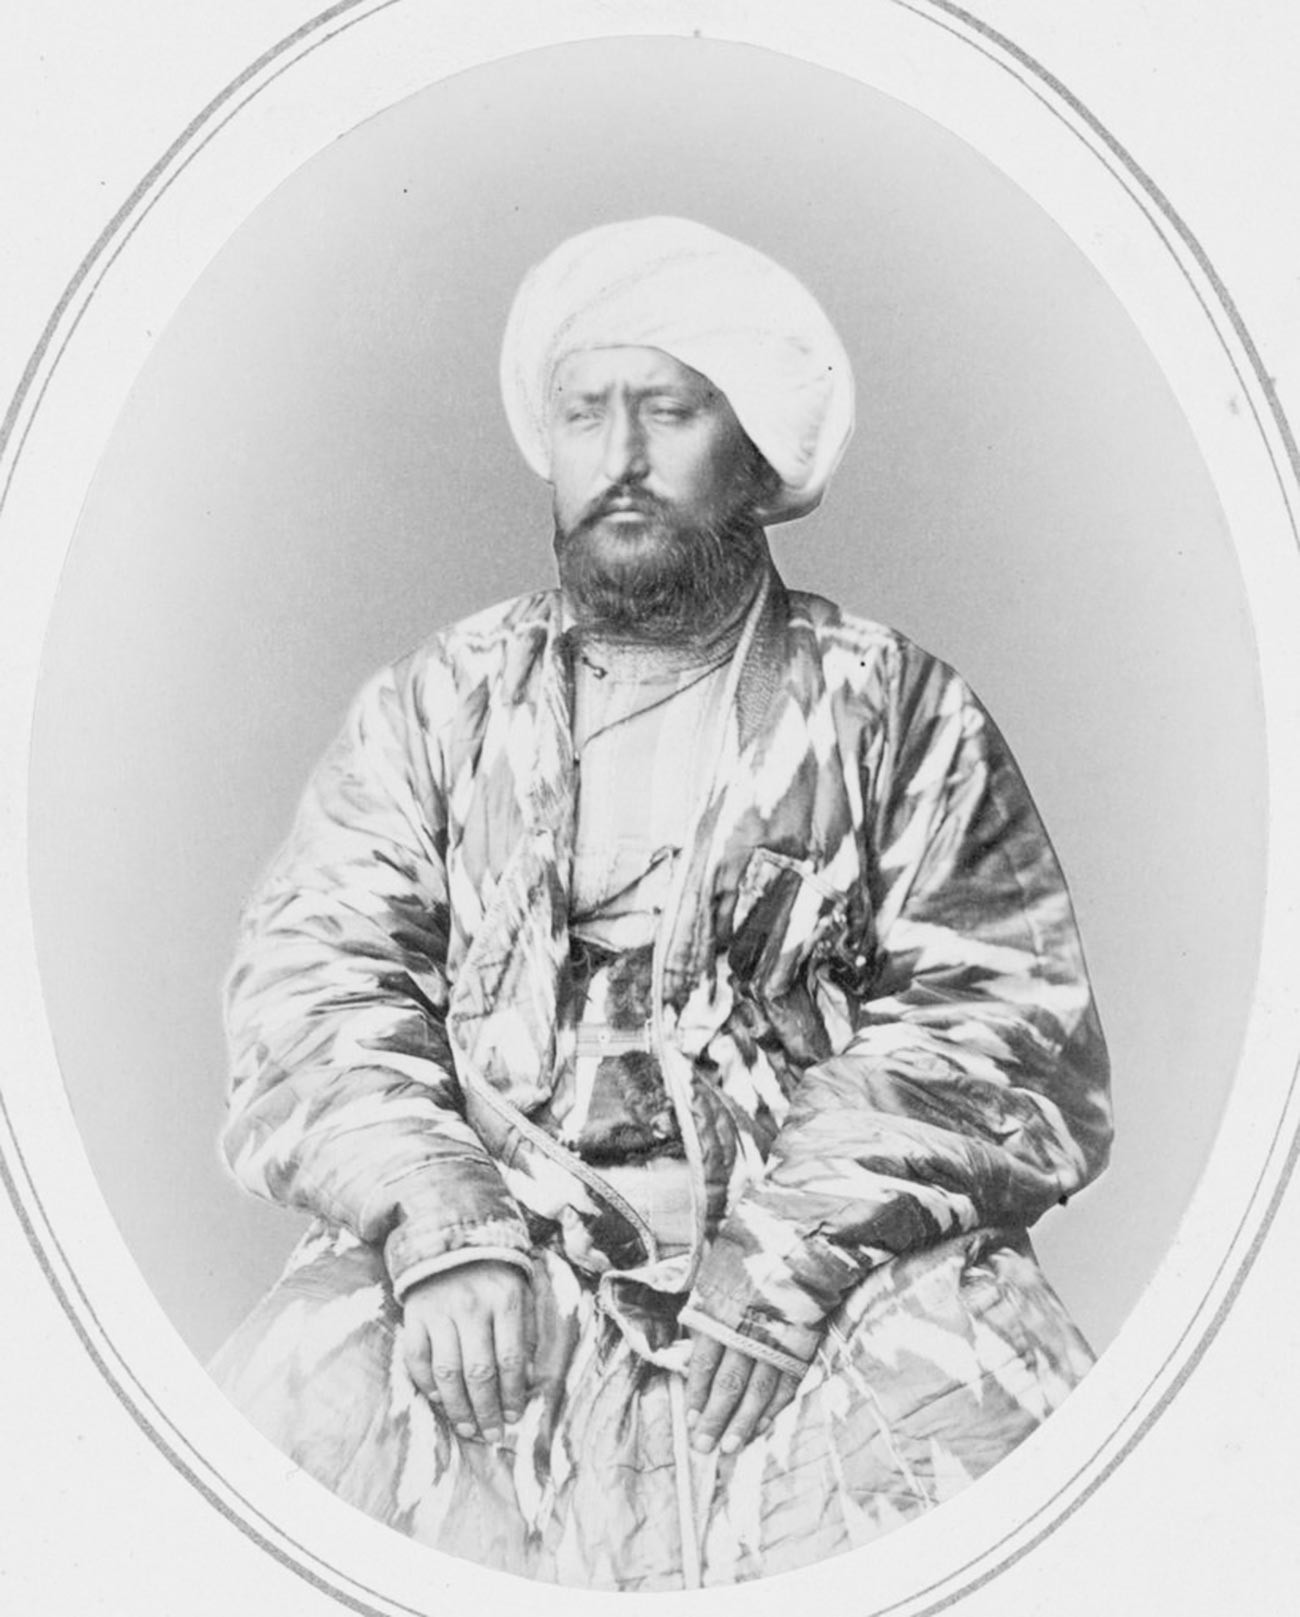 Muhammad Khudayar Khan, o cã de Cocande.